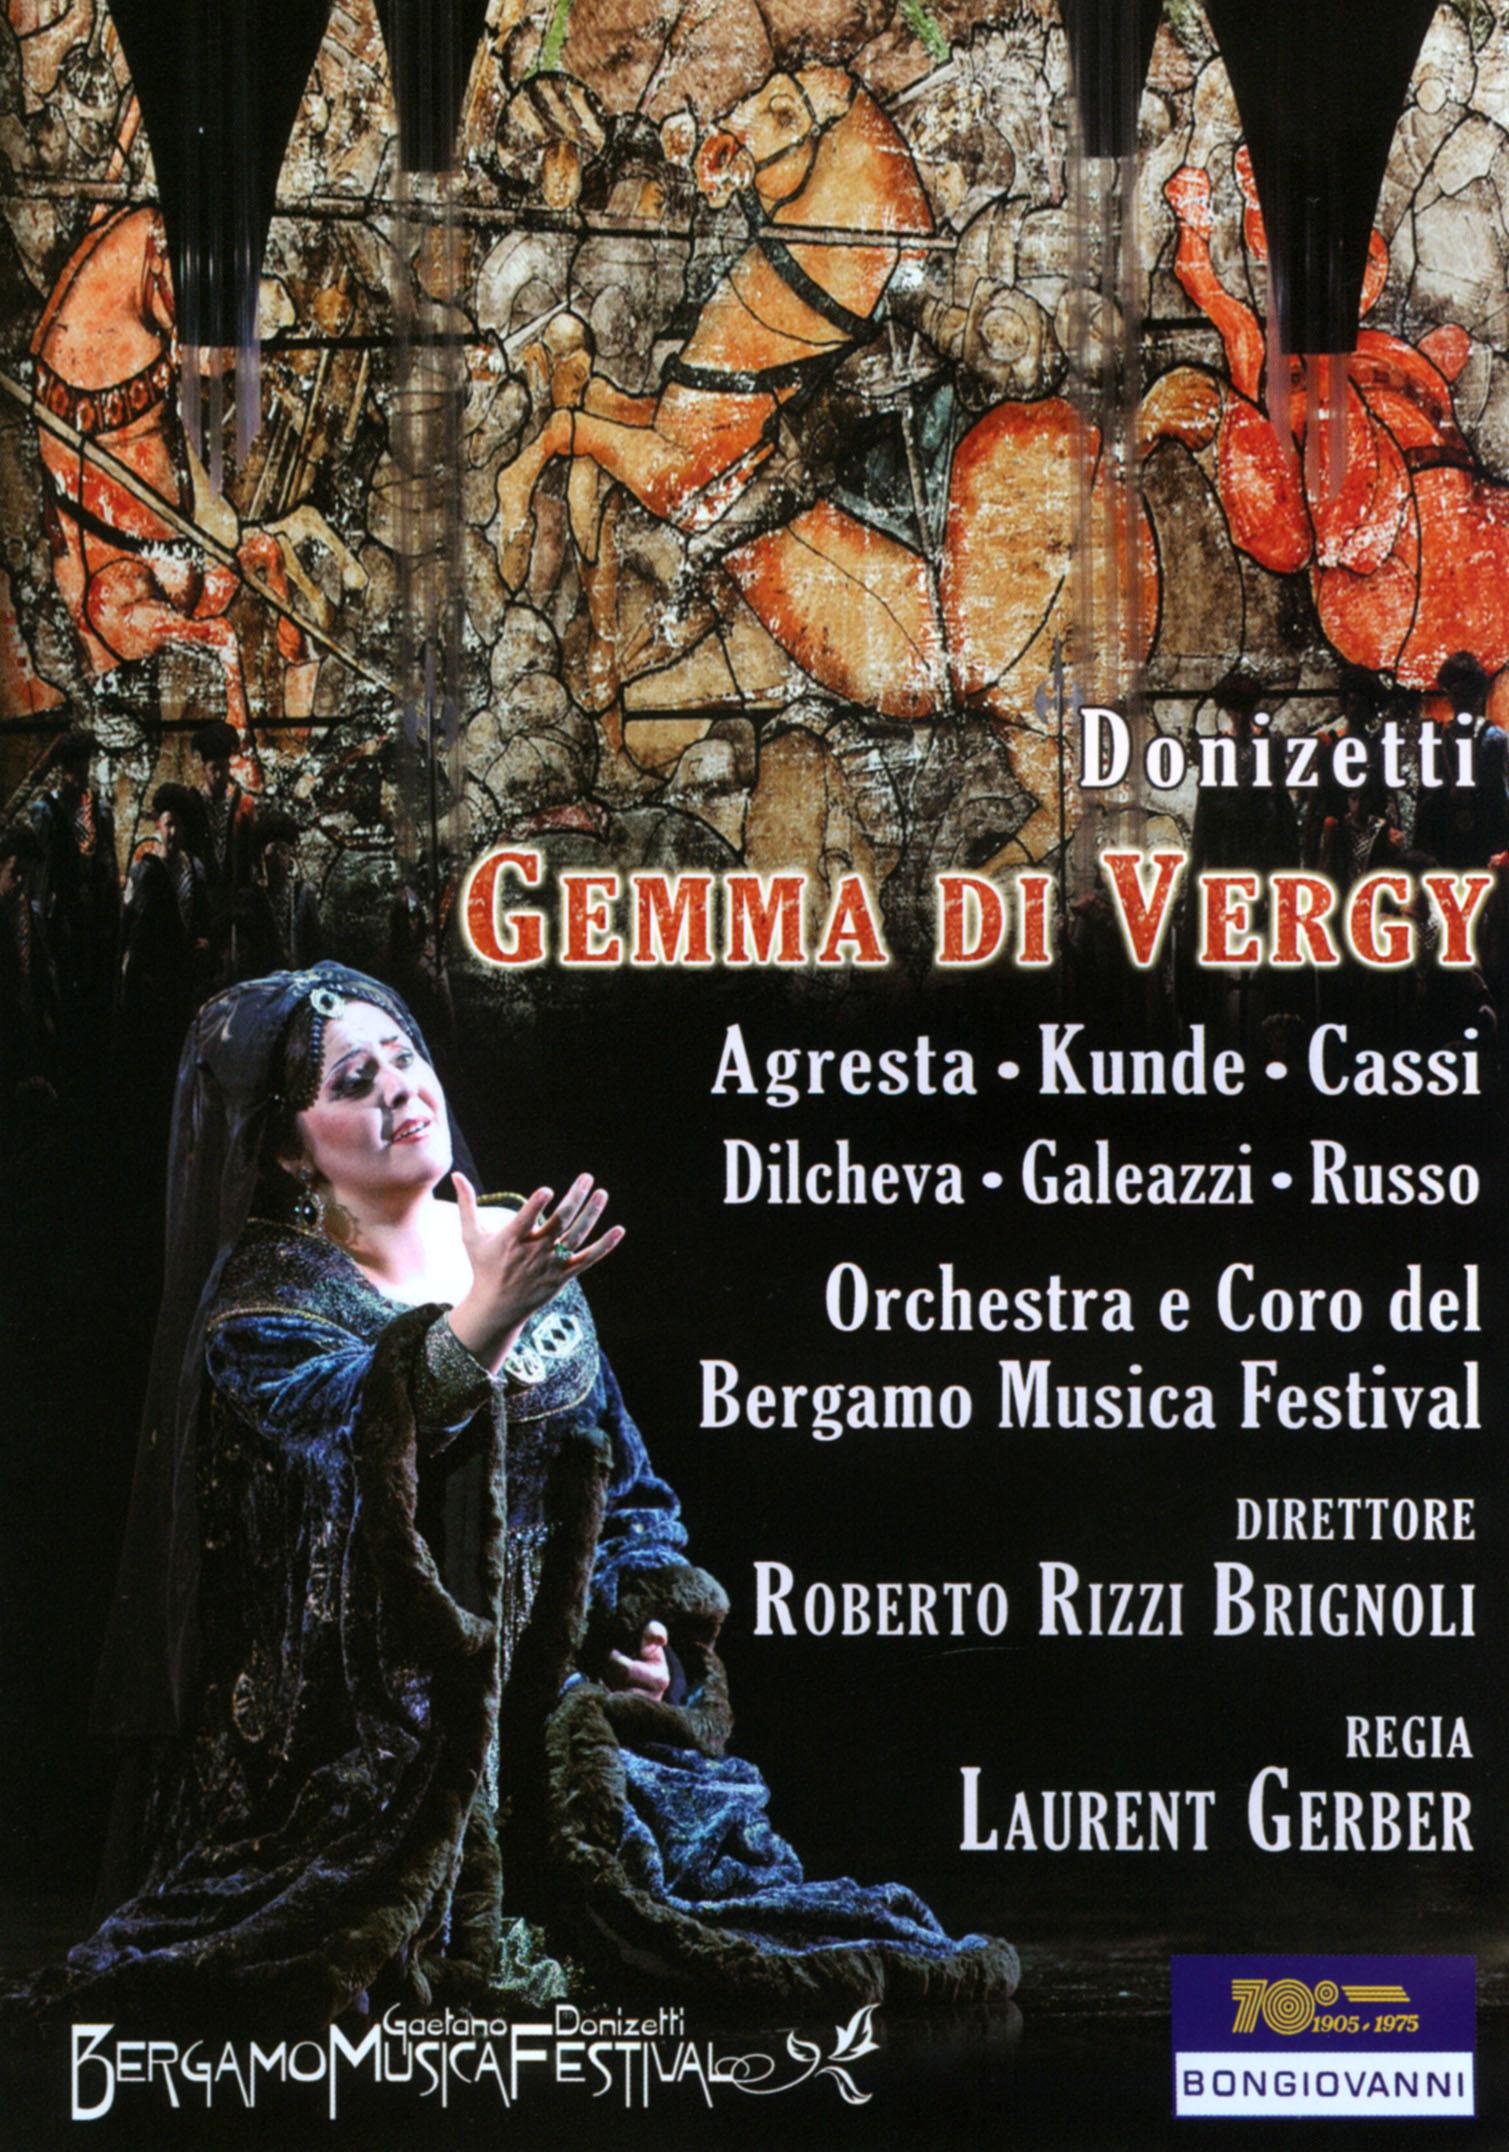 Gemma di Vergy (Bergamo Music Festival)